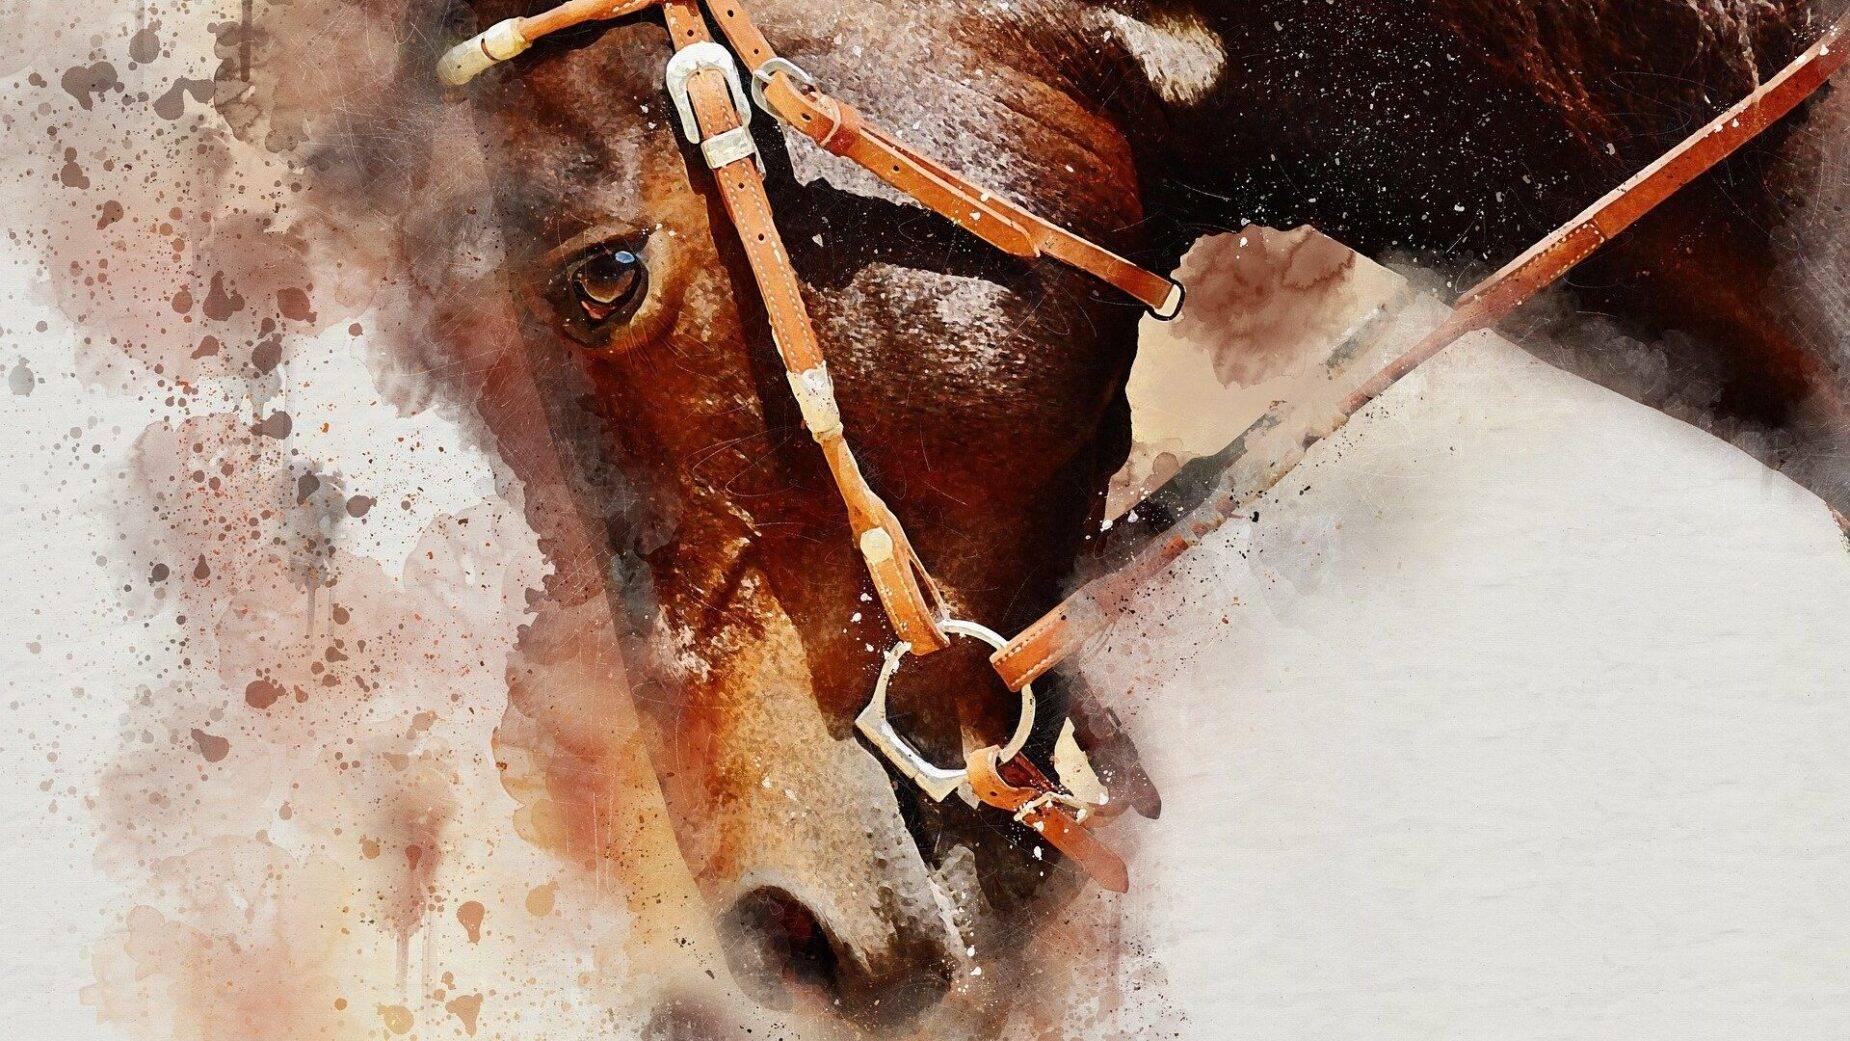 Toerisme Ariège Sport Paardrijden Illustratie Paard